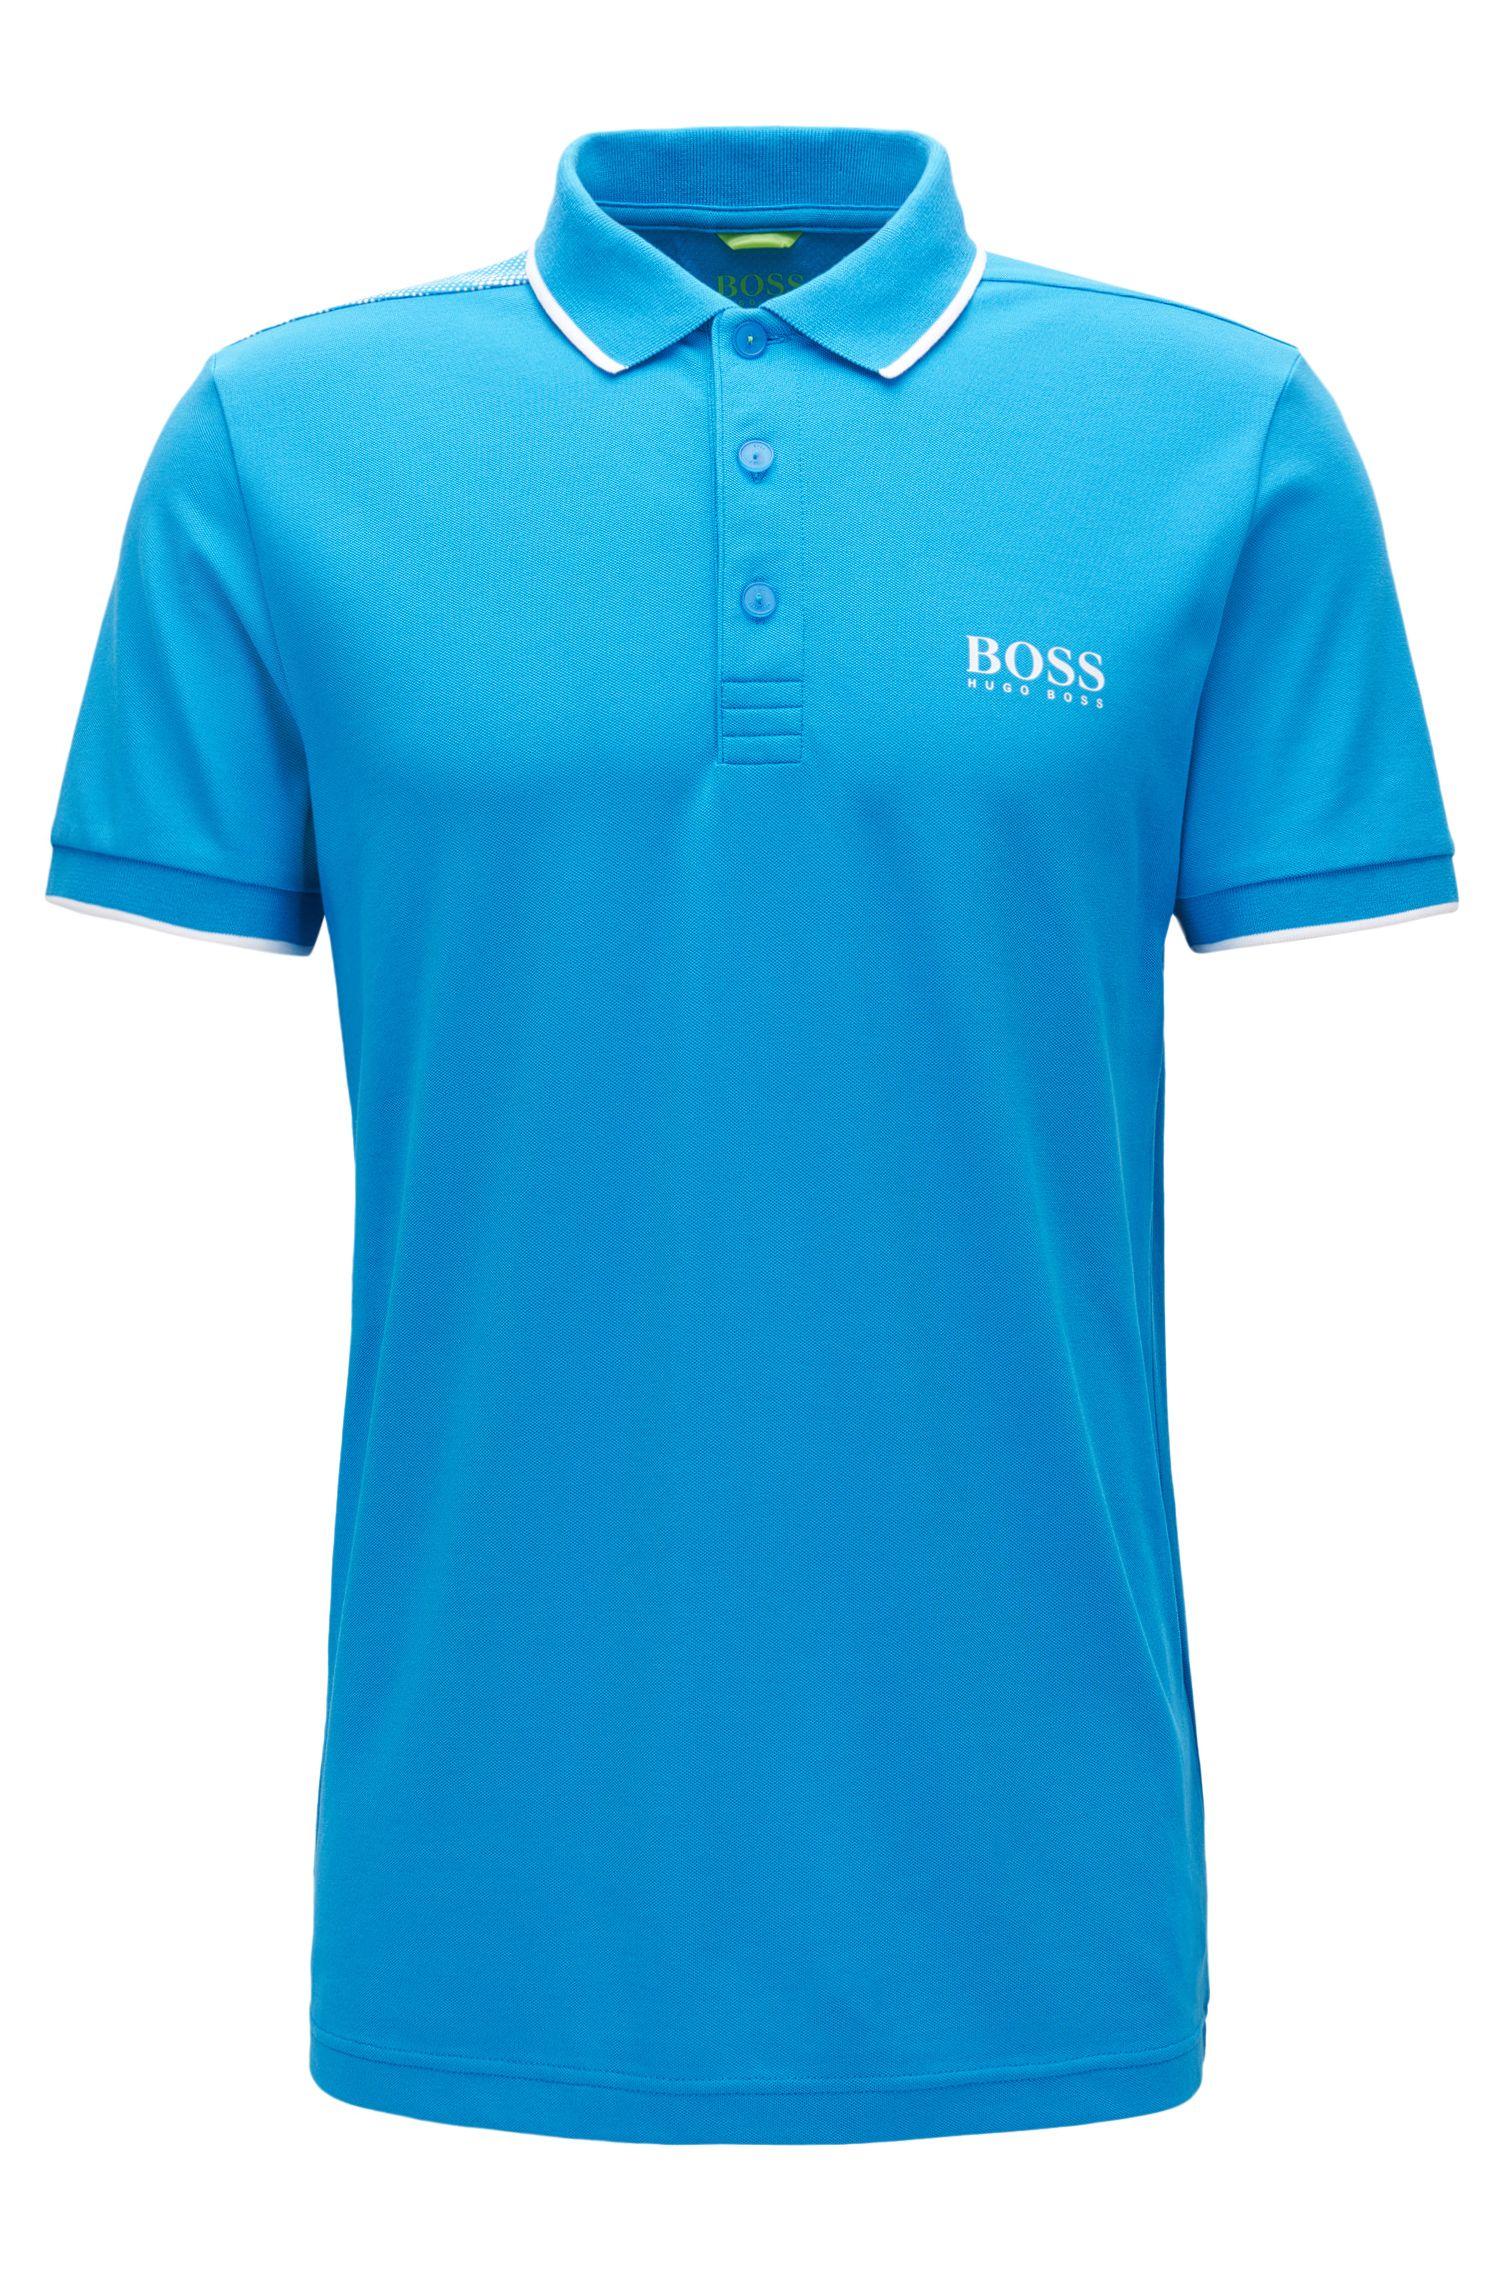 Tipped Cotton Blend  Polo Shirt, Slim Fit | Paul Pro